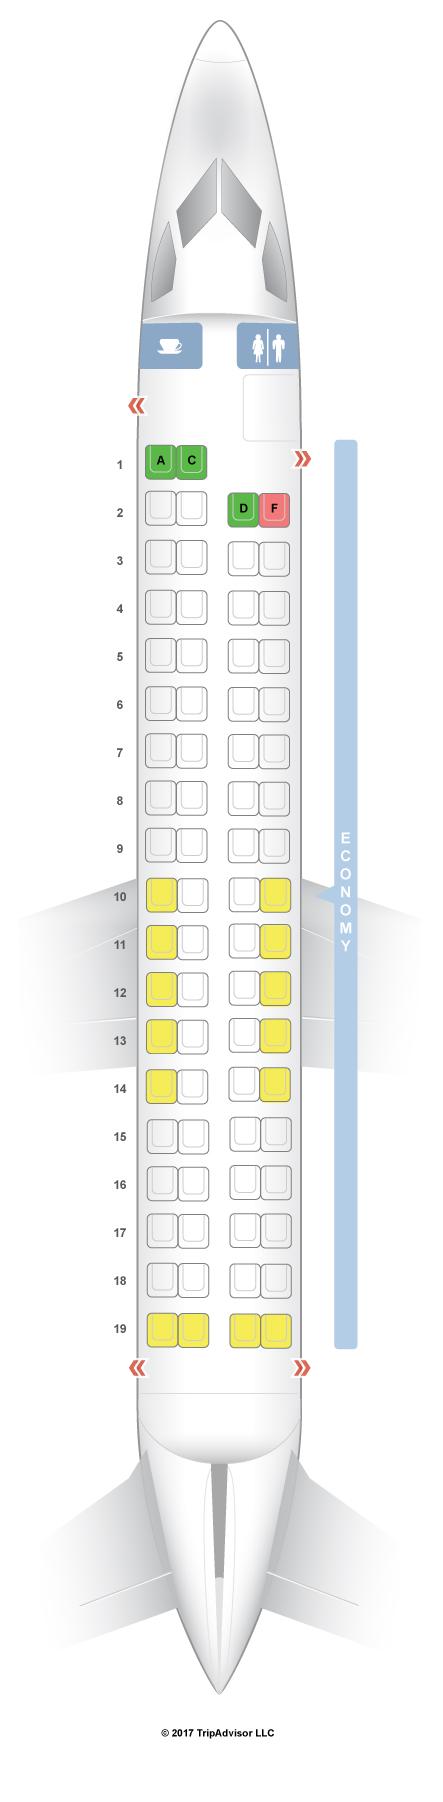 Air Canada Seat Assignments Brokeasshome Com